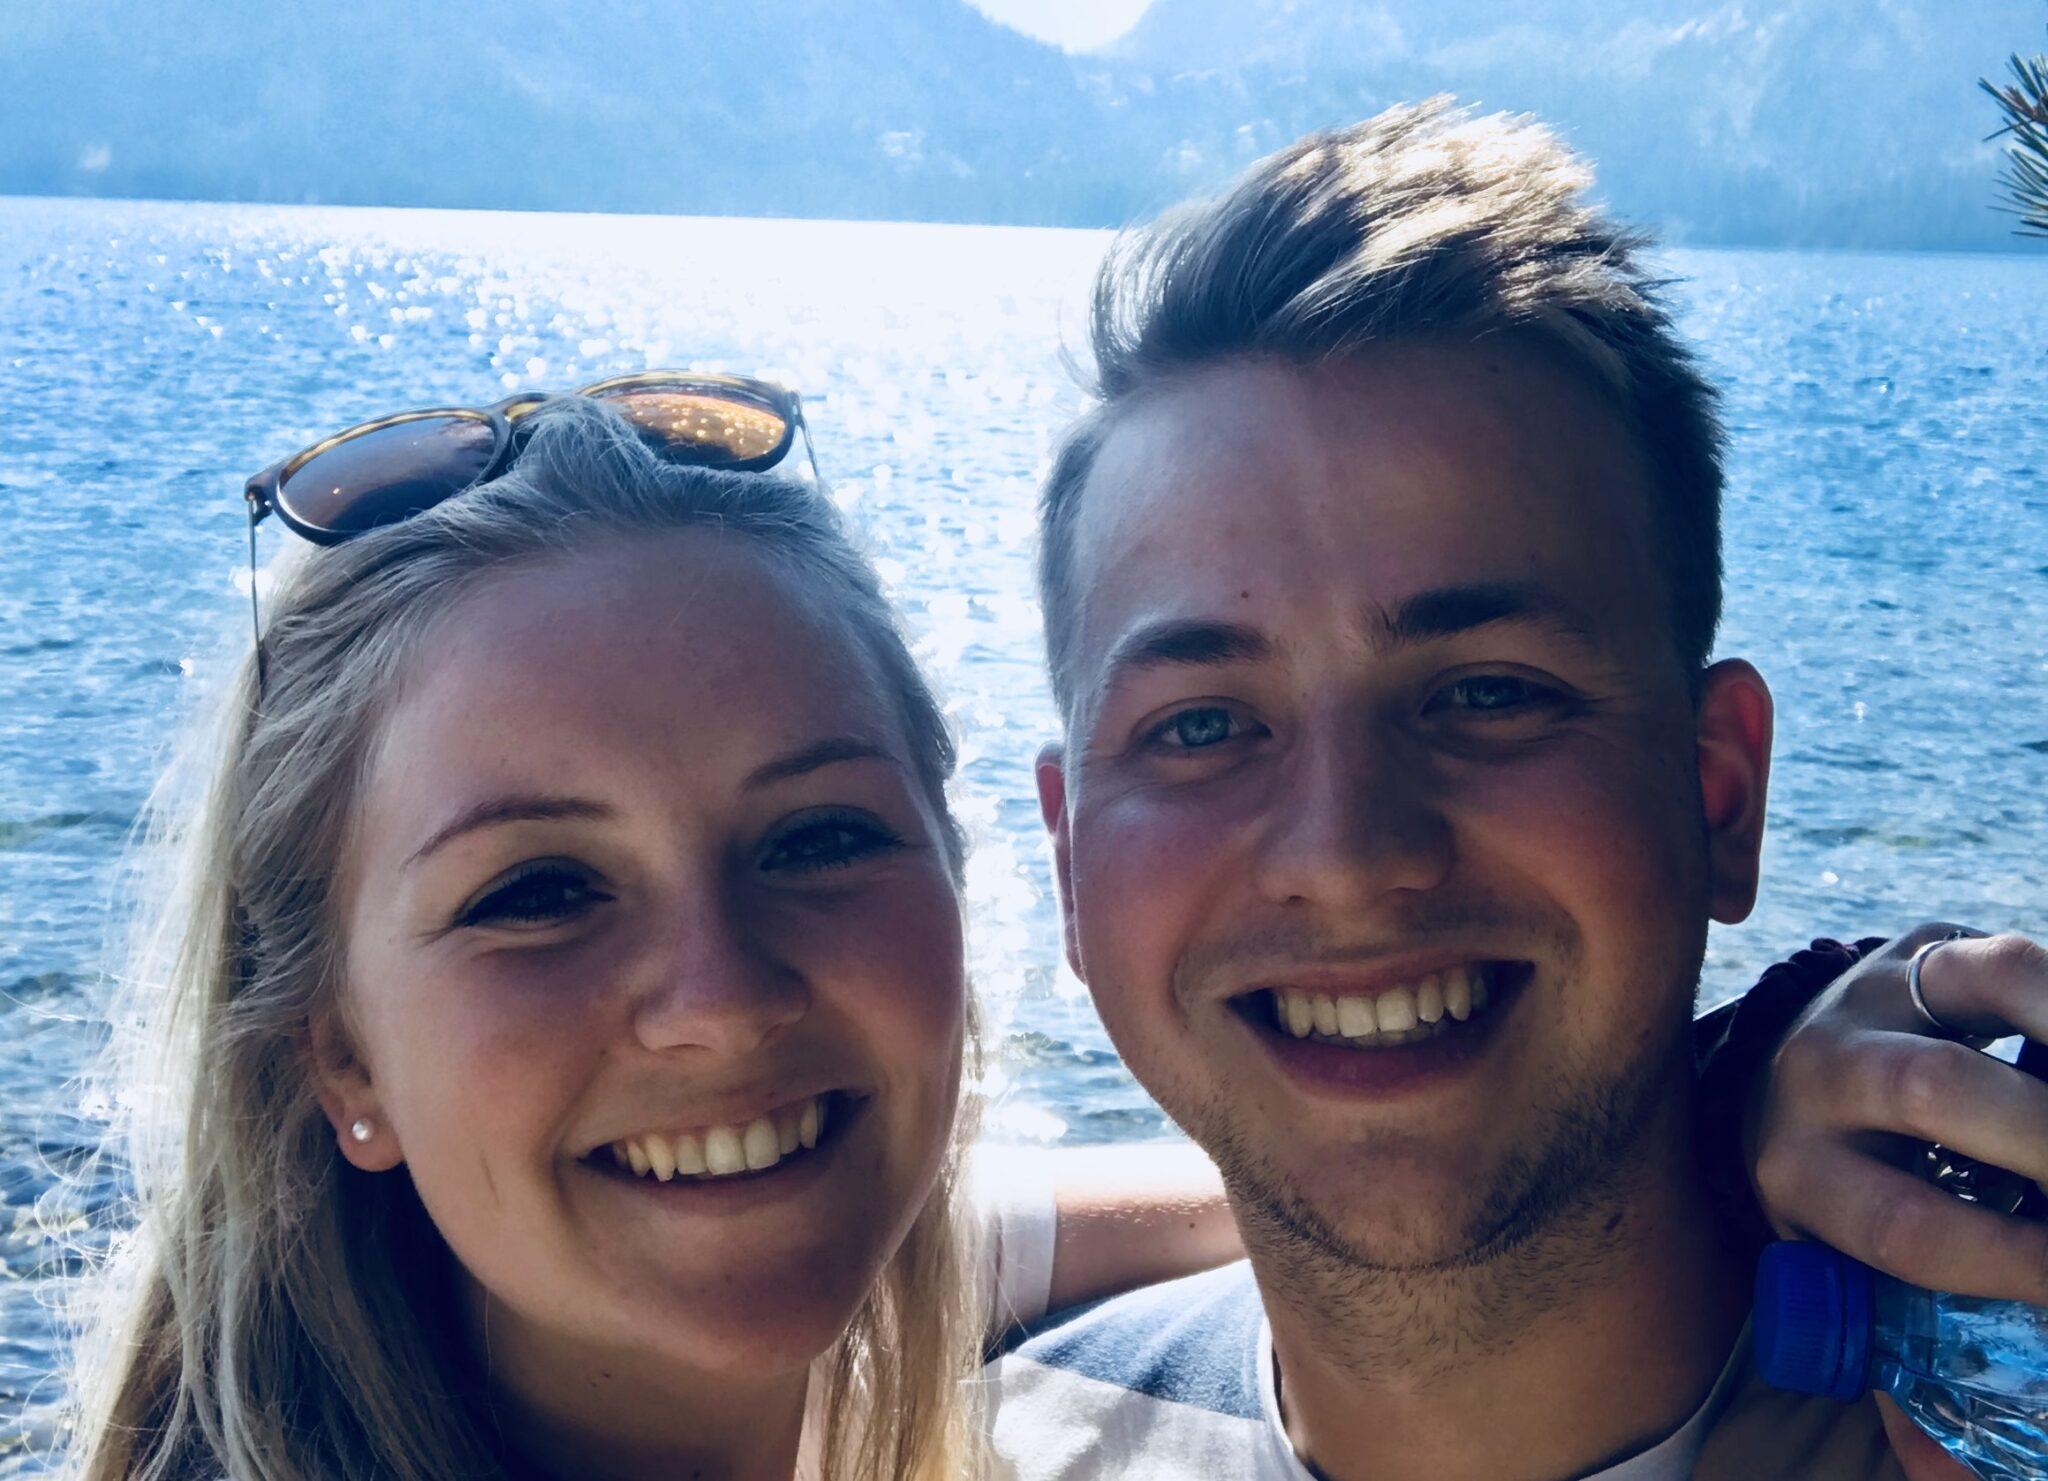 Valerie Deleij (23) en Jean-Luc Stook (25) bergse stadswandeling